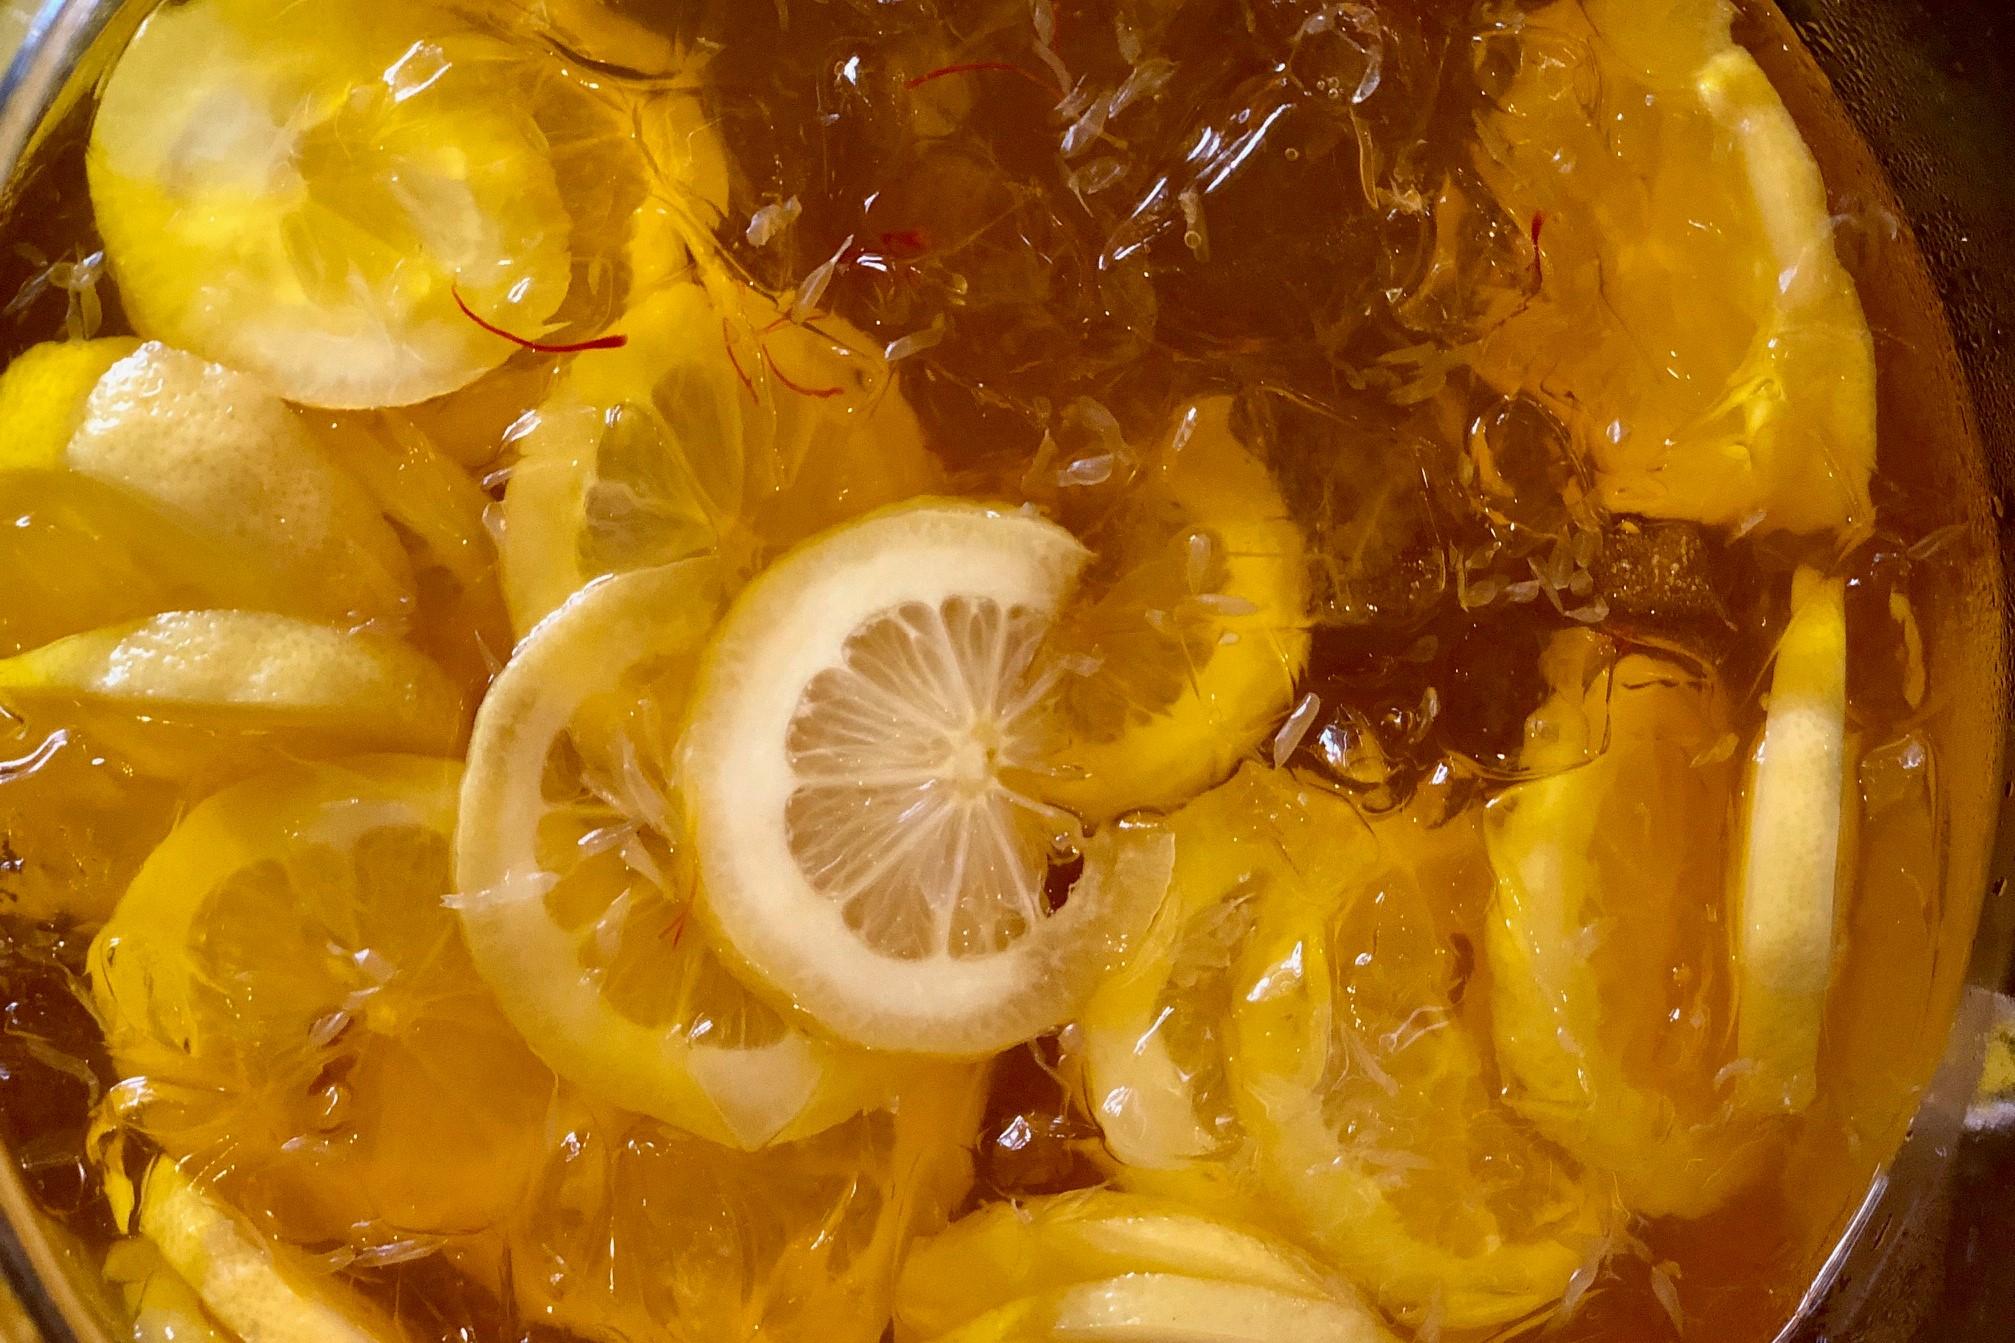 Saffron lemonade sm 3x2